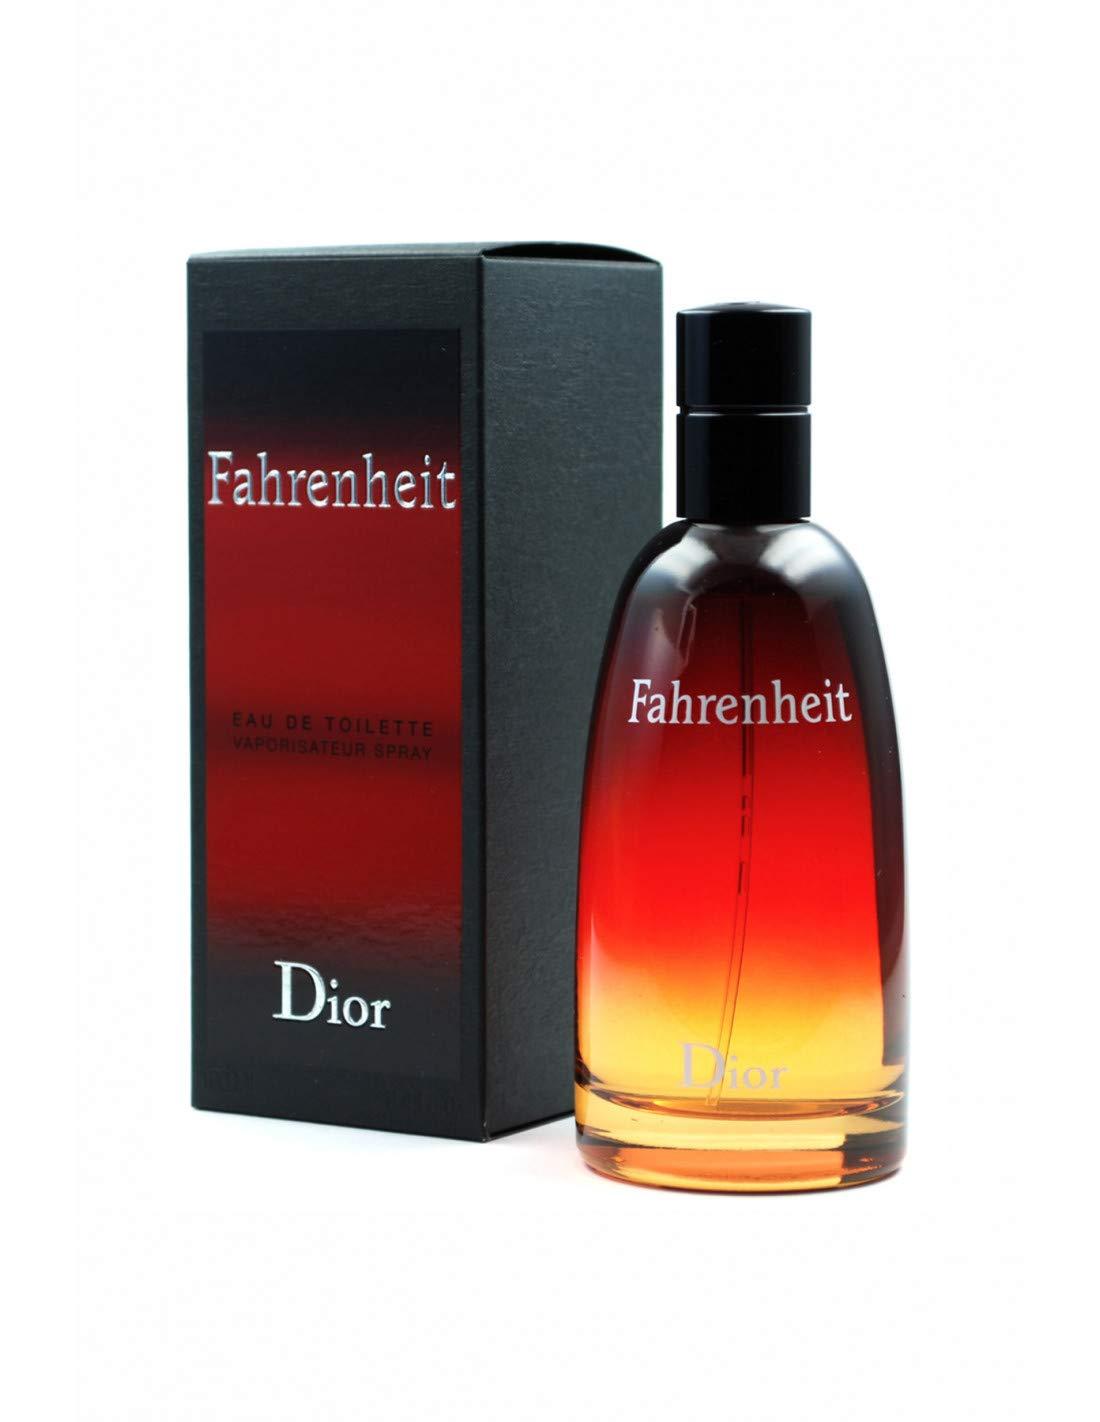 Christian Dior Fahrenheit for Men, 1.7 Ounce Eau de Toilette Spray